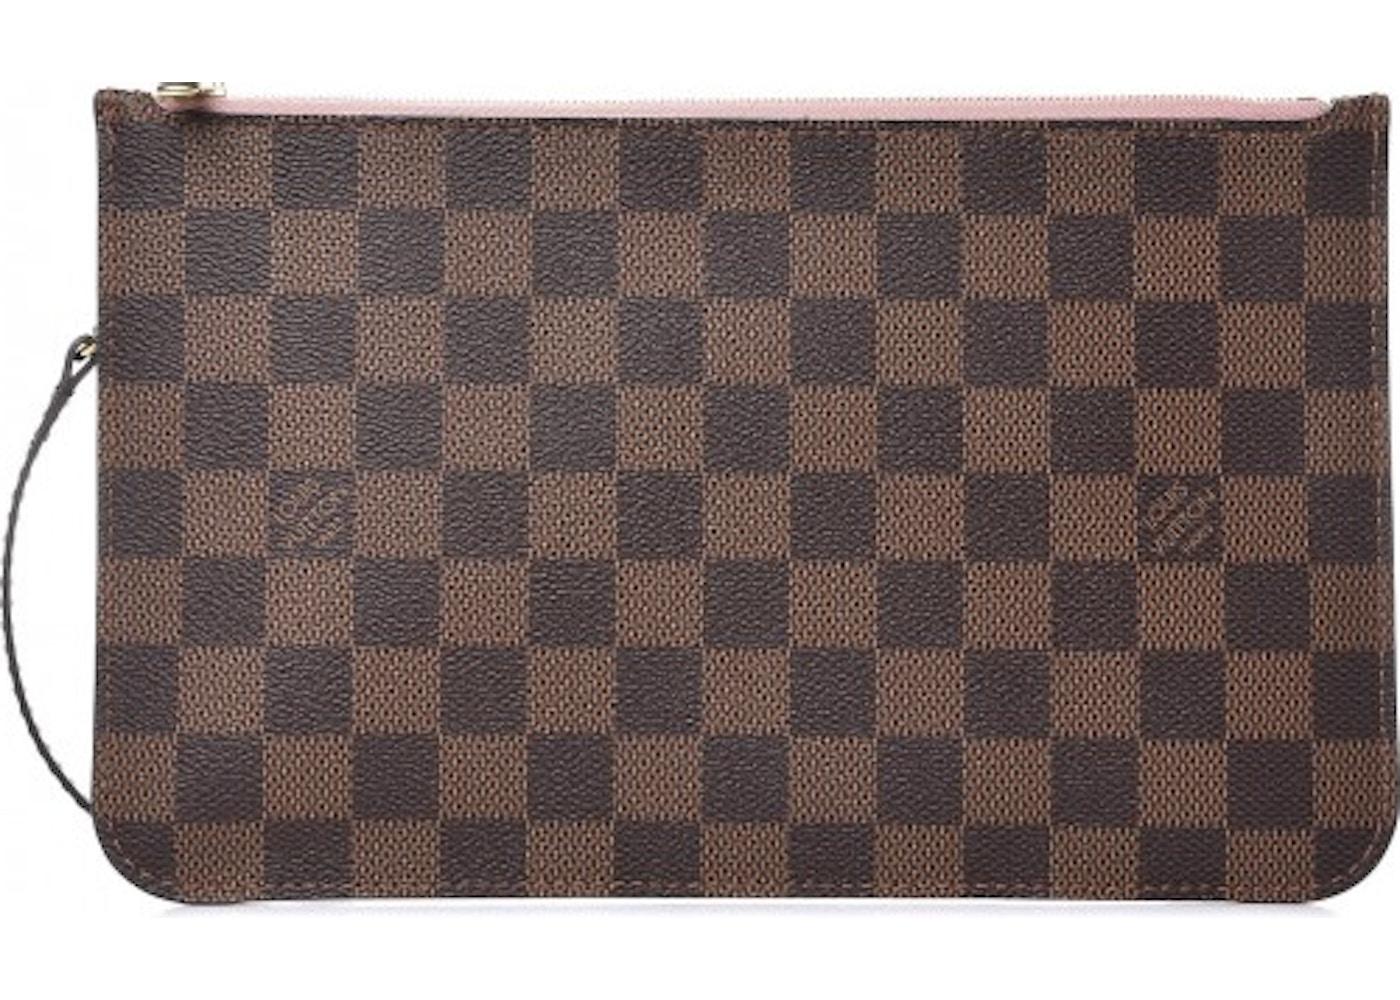 f8de33cc86f6 Luxury Handbags in Black - New Highest Bids